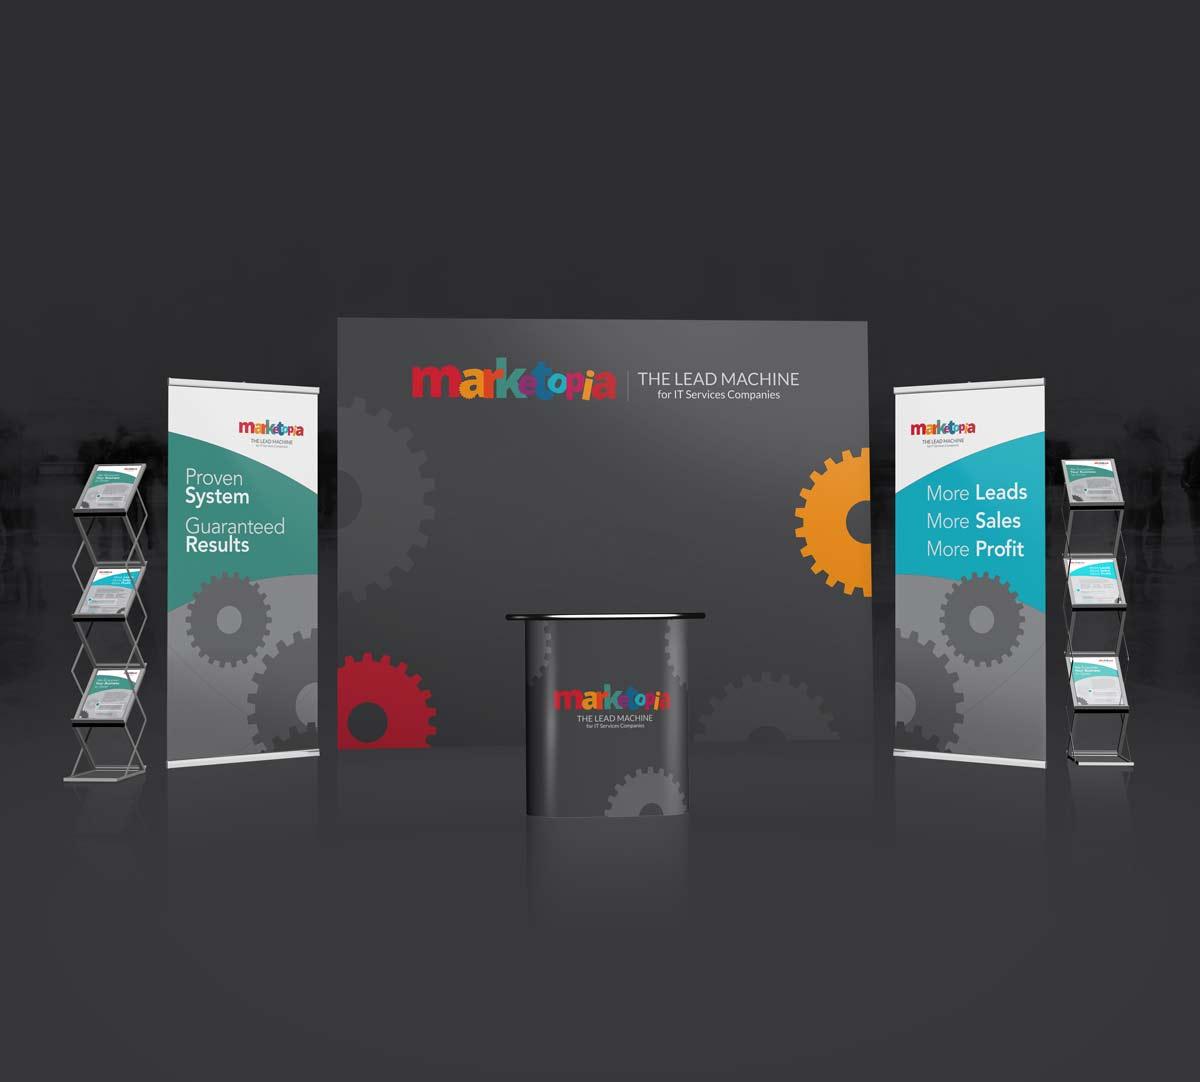 jaredlantzman-portfolio-trade-show-banners-design-graphic-clearwater-tampa-fl